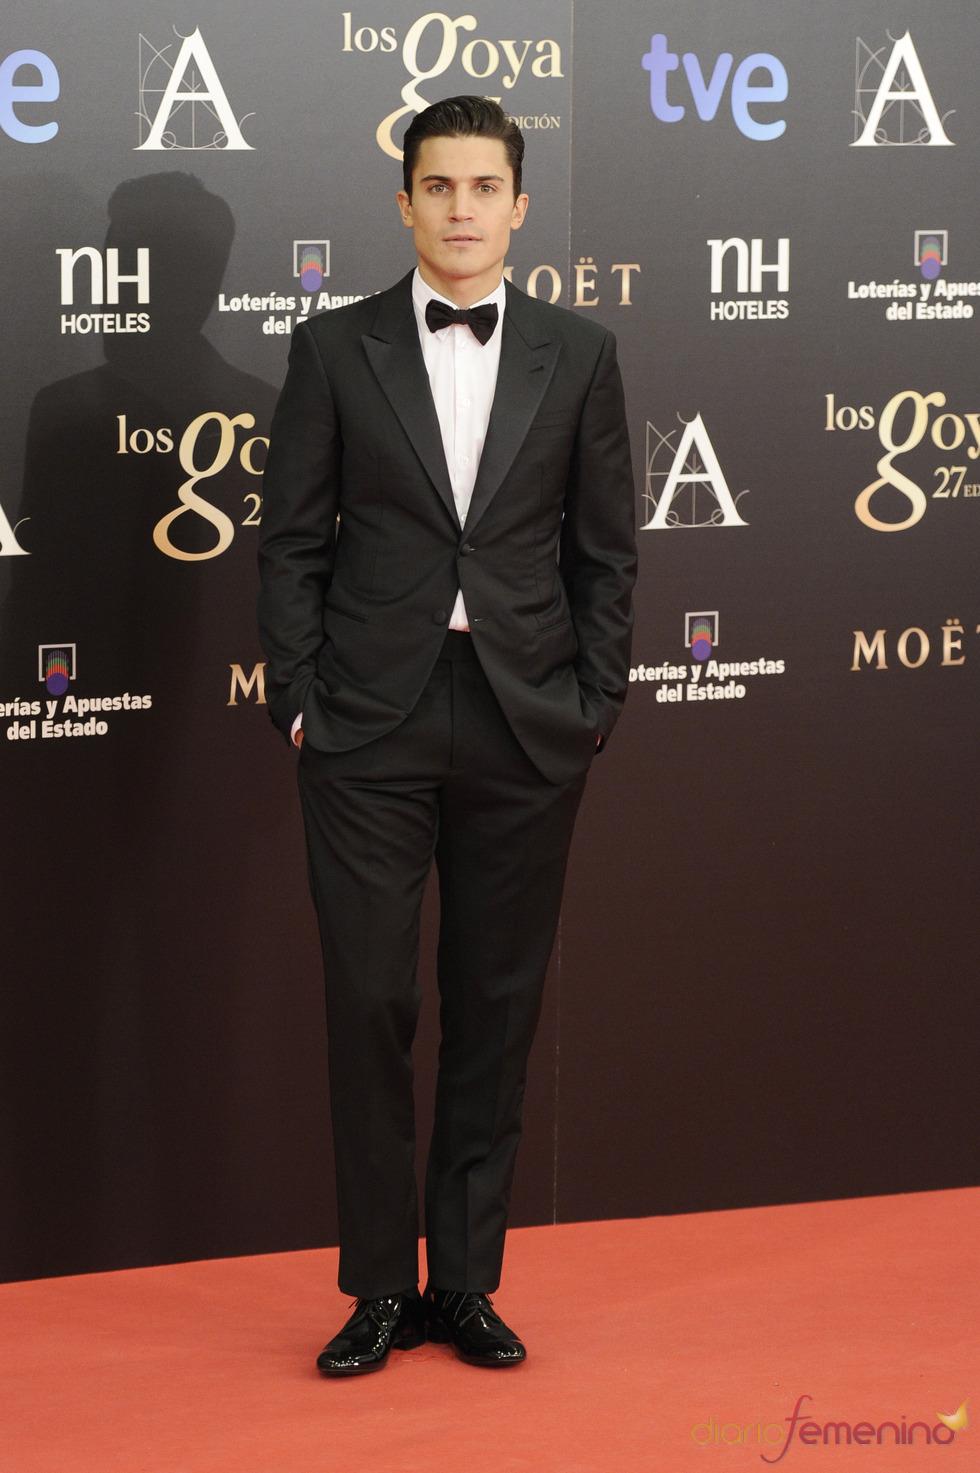 Alex González en la alfombra roja de los Goya 2013